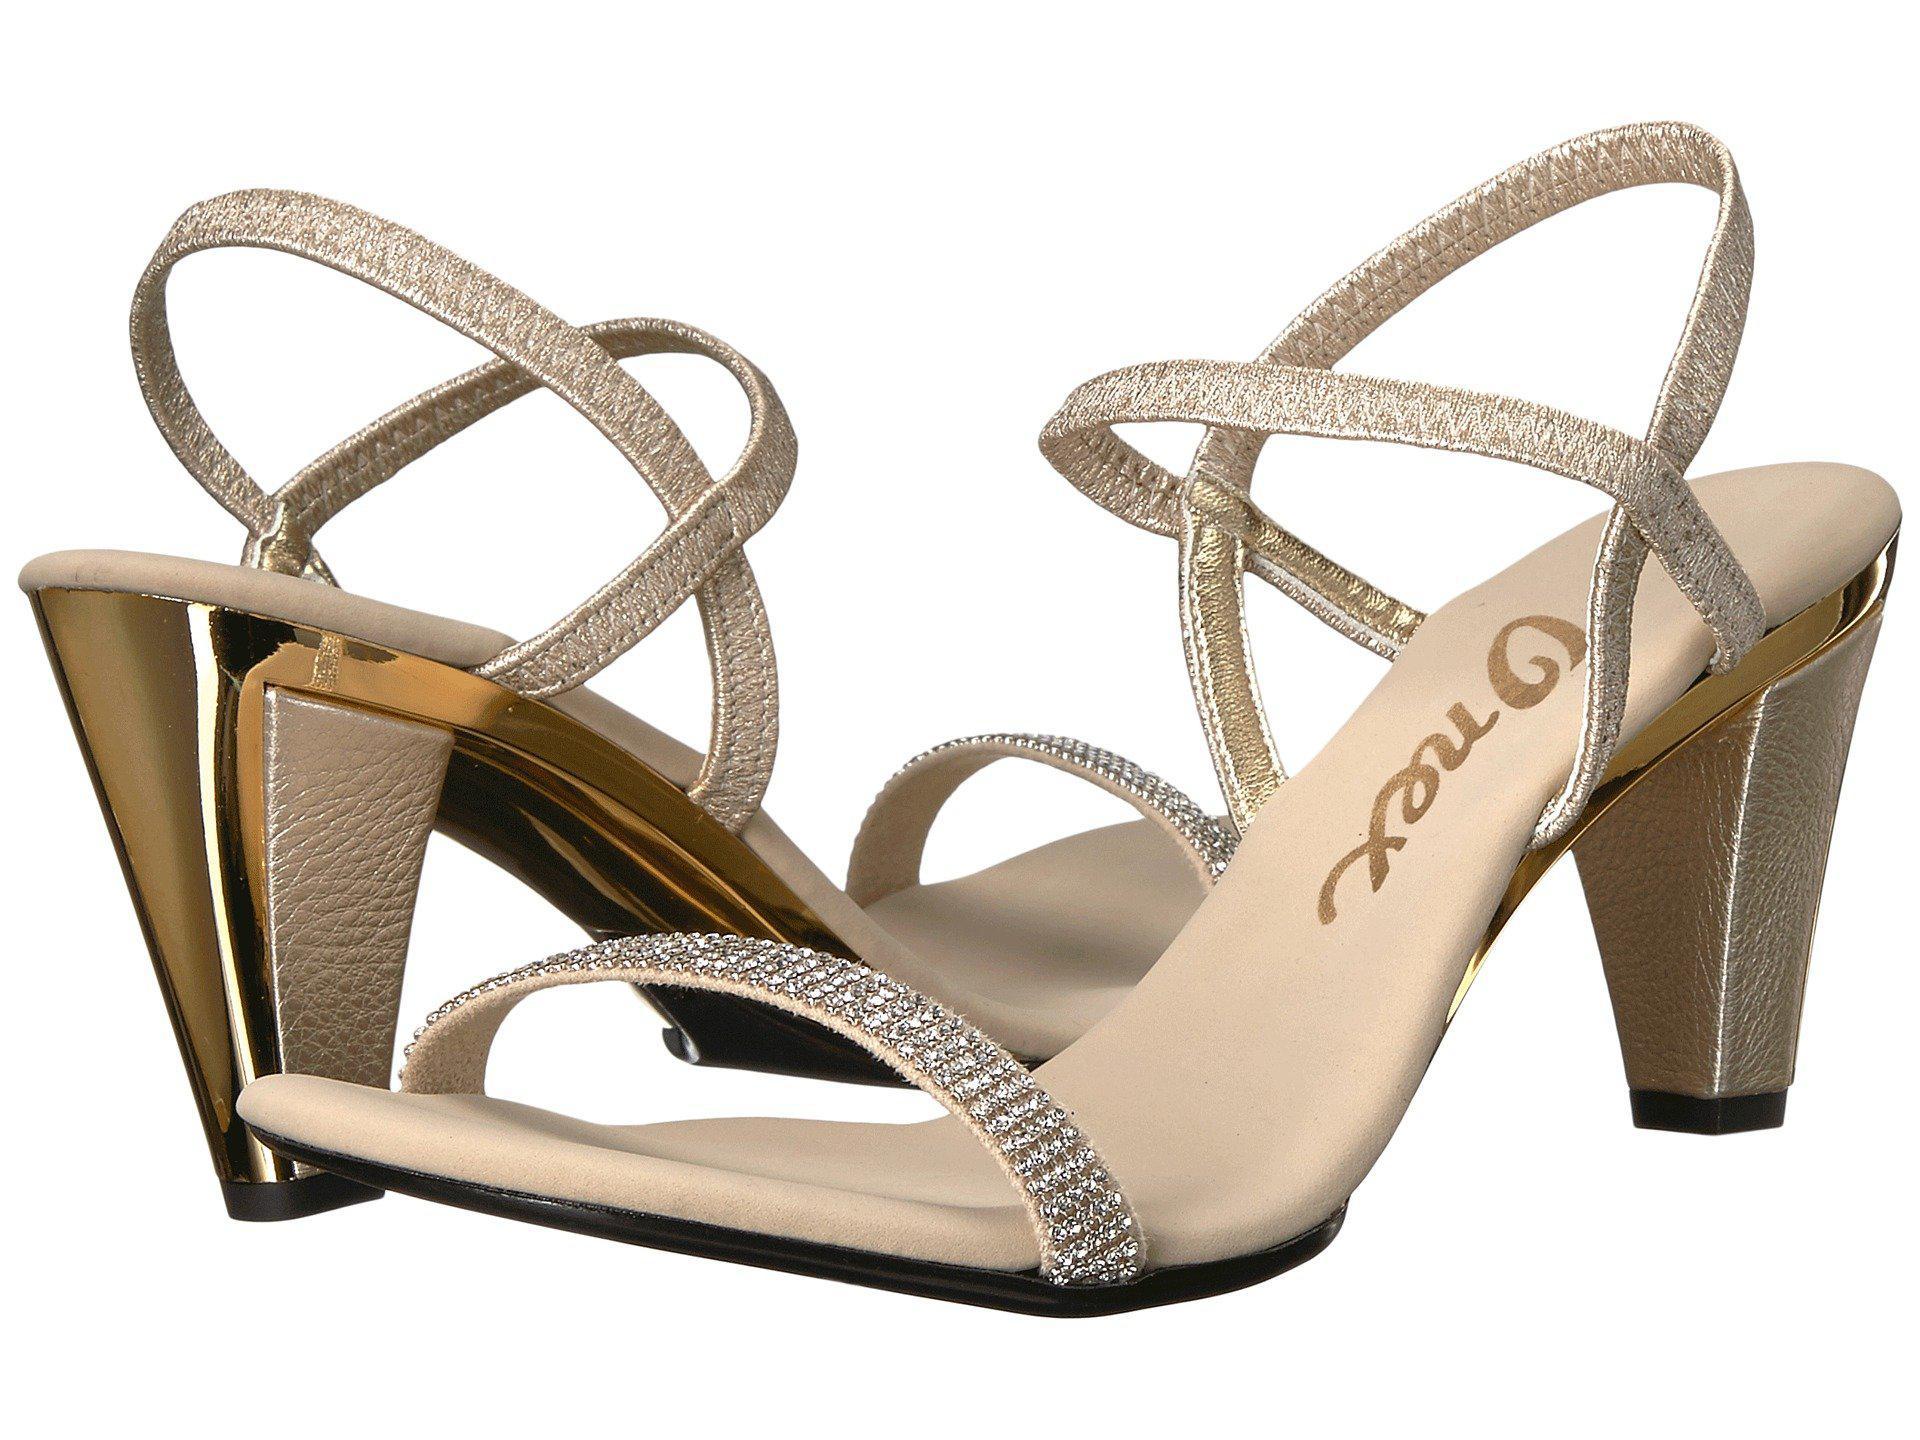 6910c0c8a Lyst - Onex Iced (black silver) Women s Dress Sandals